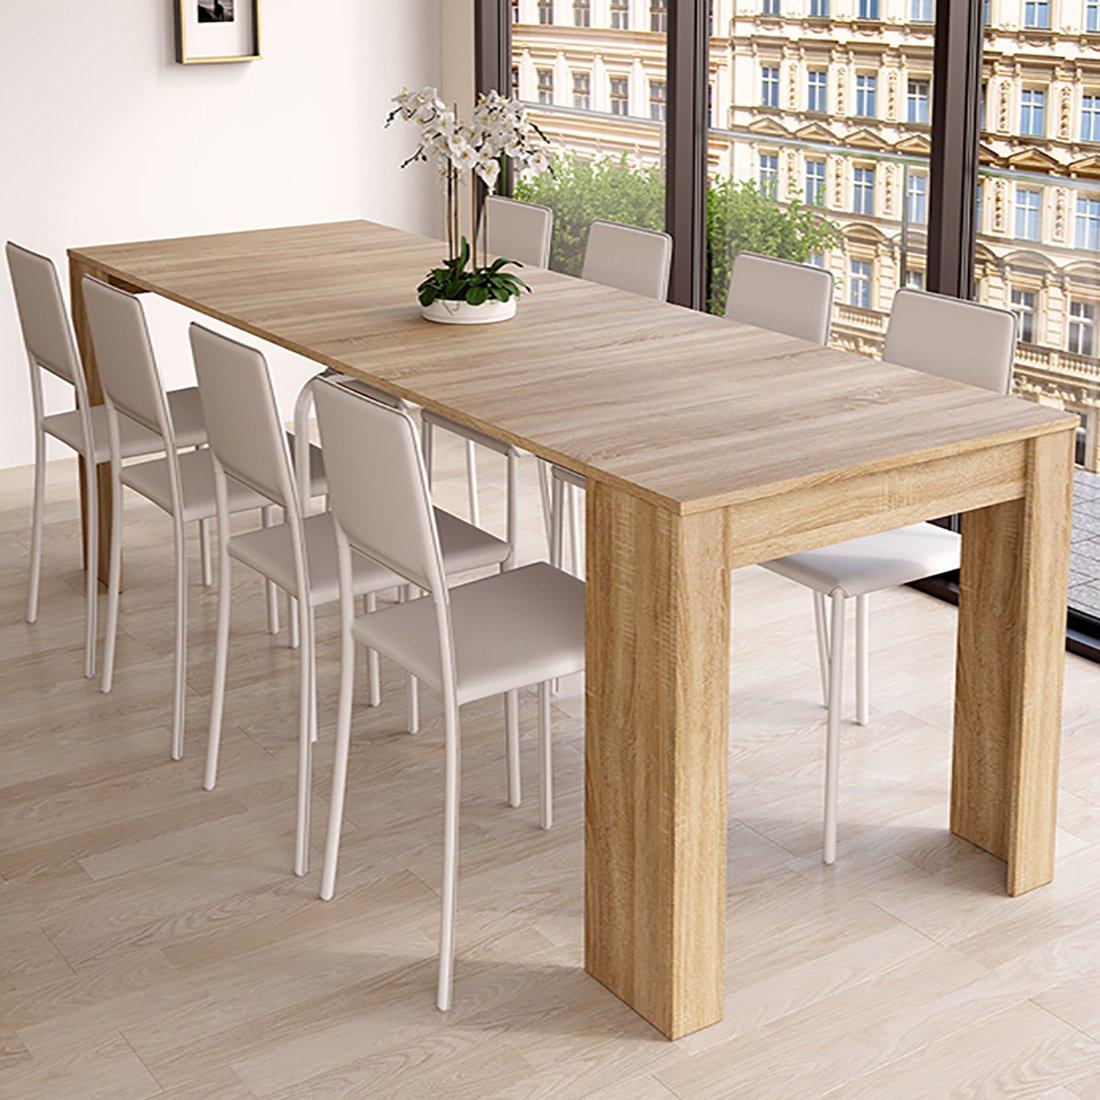 Medidas de una mesa de comedor best mesa comedor anca - Medidas mesas de comedor ...